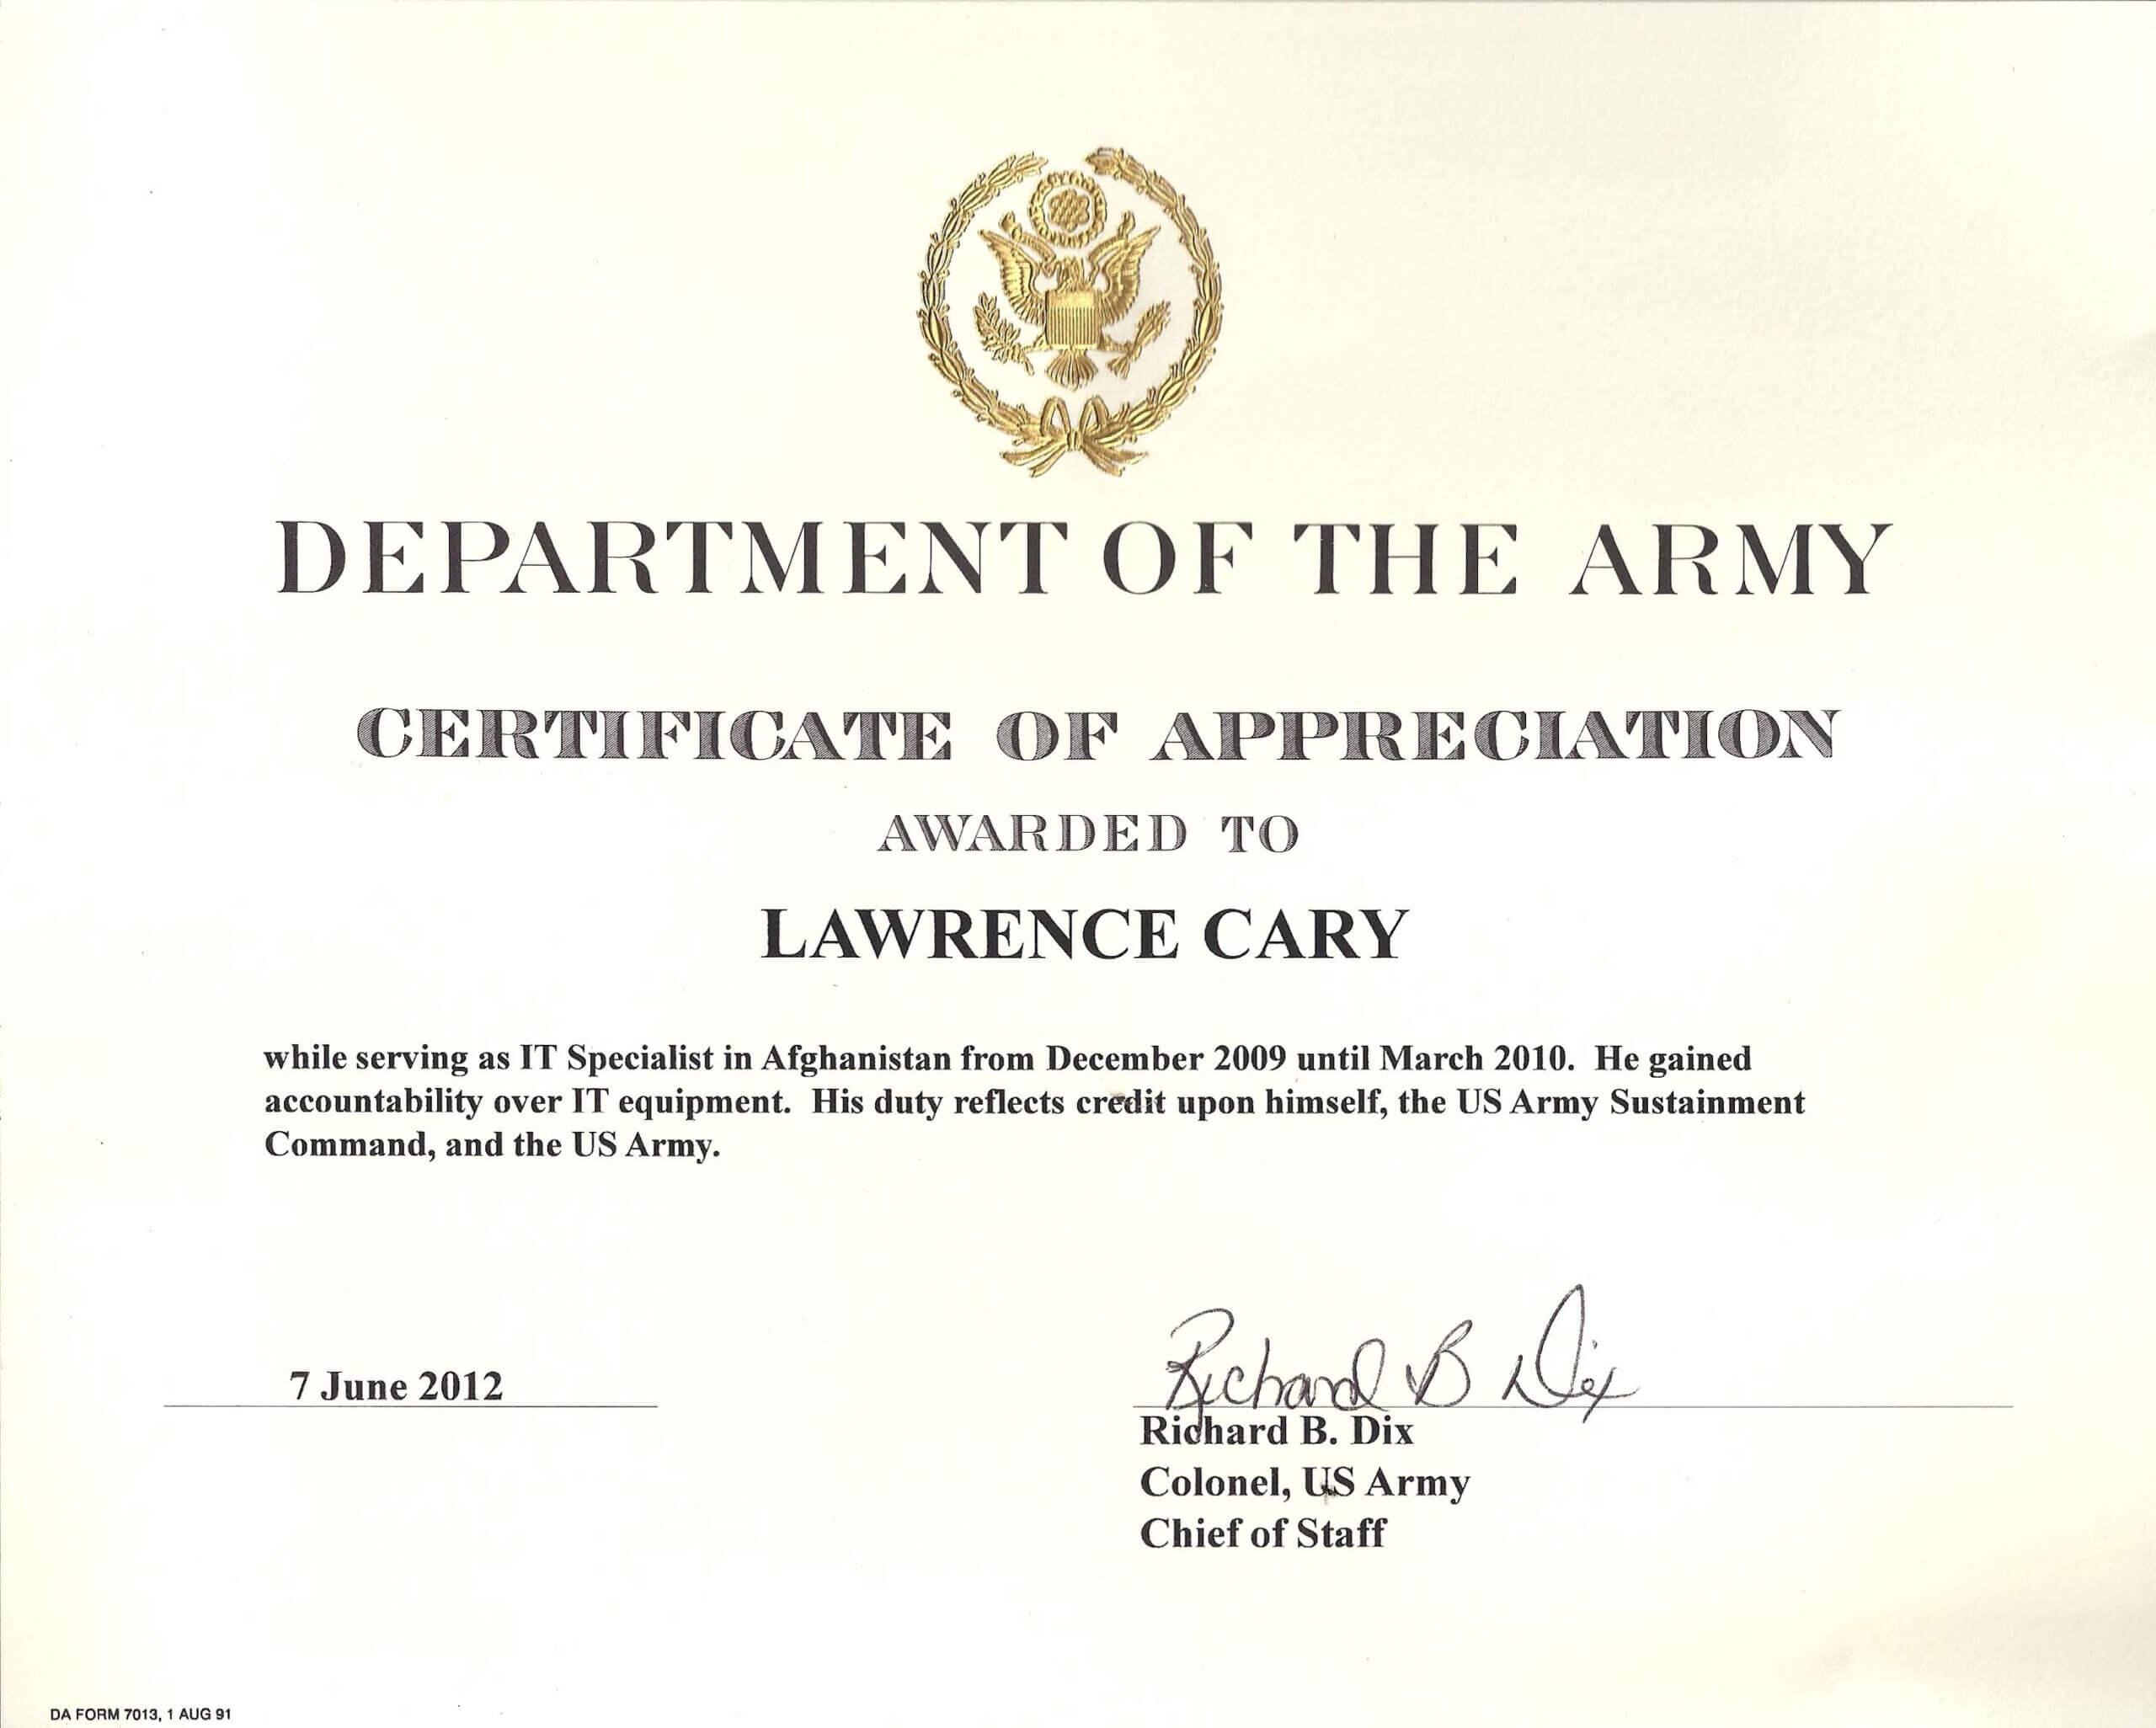 6+ Army Appreciation Certificate Templates - Pdf, Docx Regarding Army Certificate Of Achievement Template